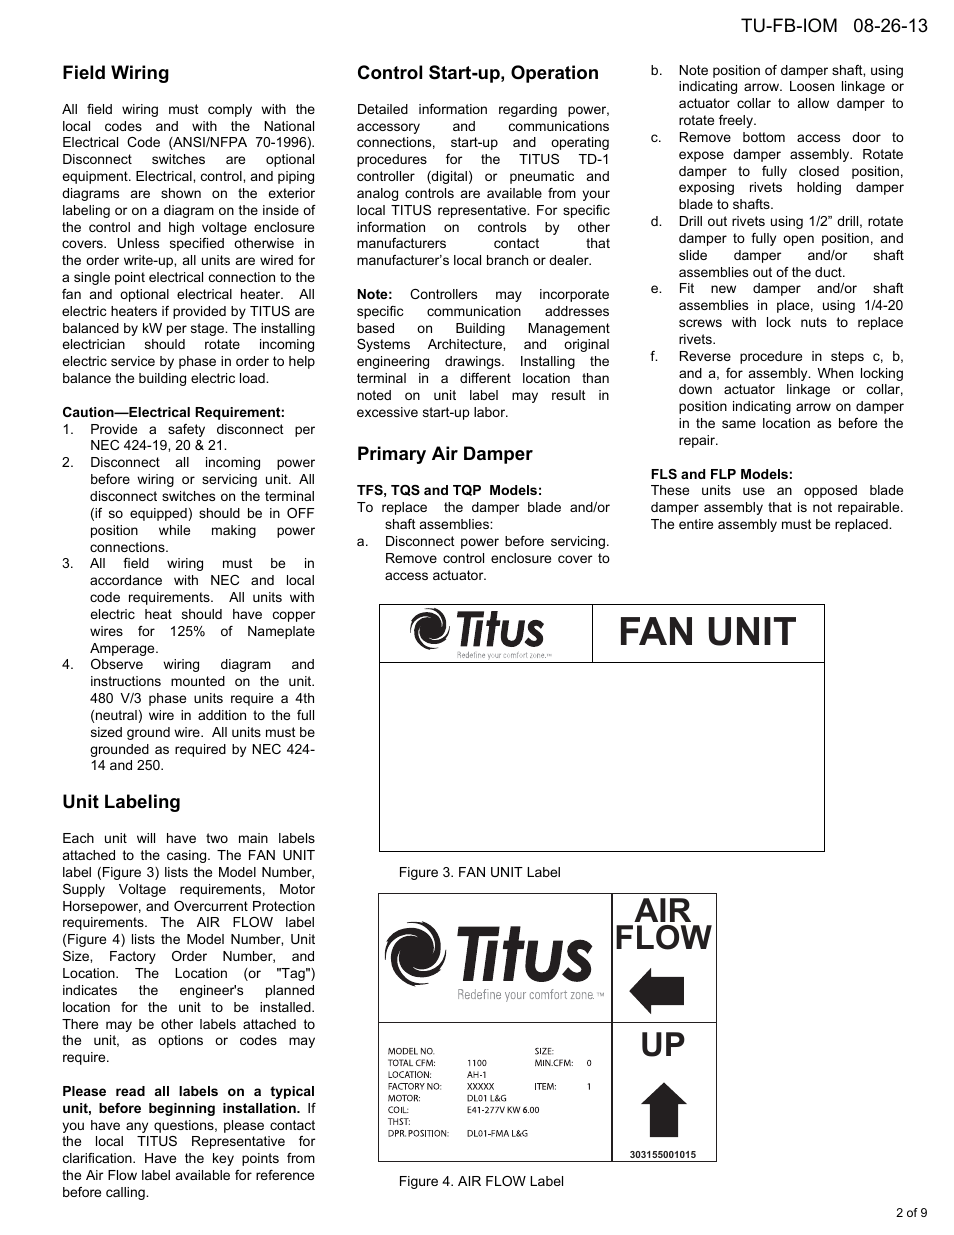 medium resolution of fan unit air flow up field wiring titus fan powered term iom rh manualsdir com titus